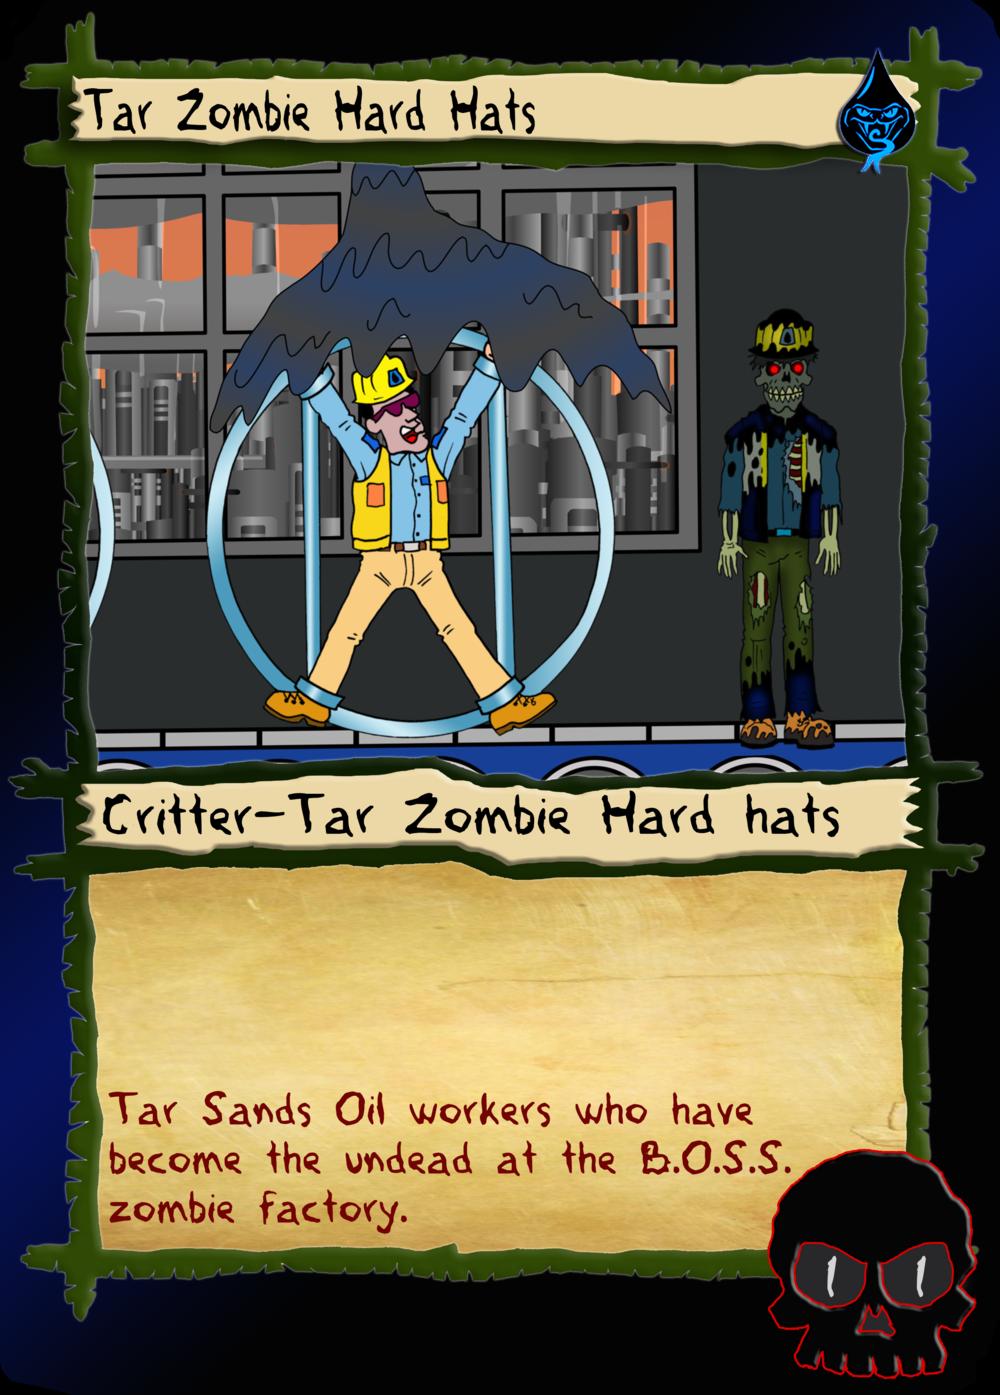 33_Tar Zombie Hard hats.png